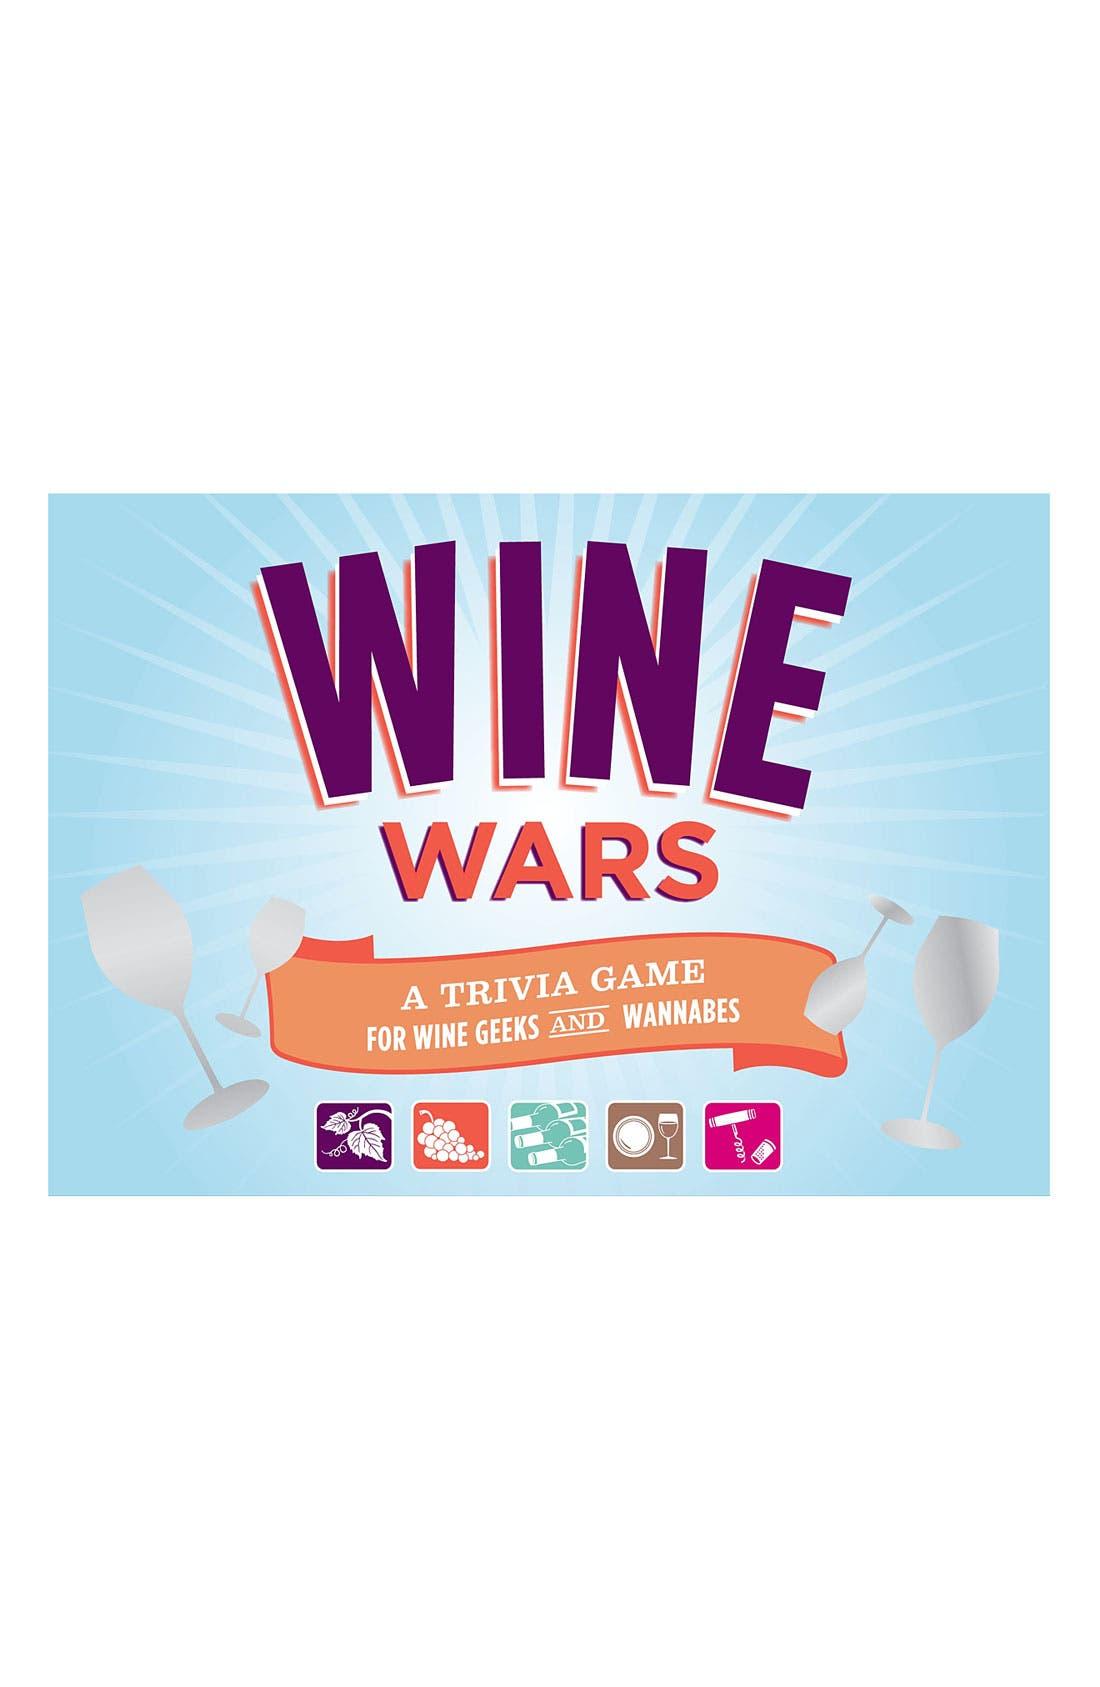 'Wine Wars' Trivia Game